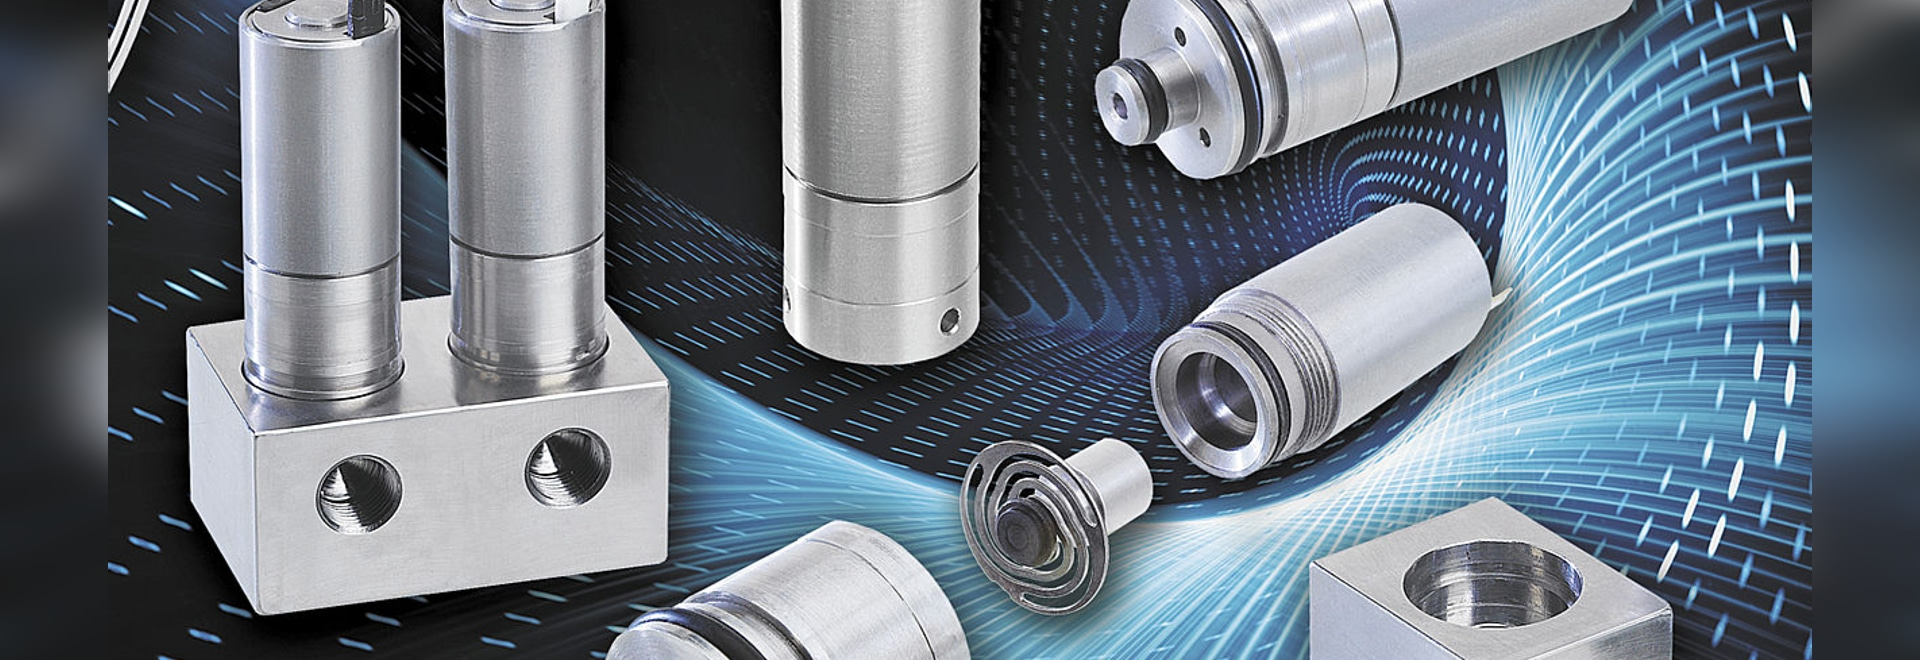 NEW CLIPPARD High Flow 2/2 Bidirectional Electronic Valves